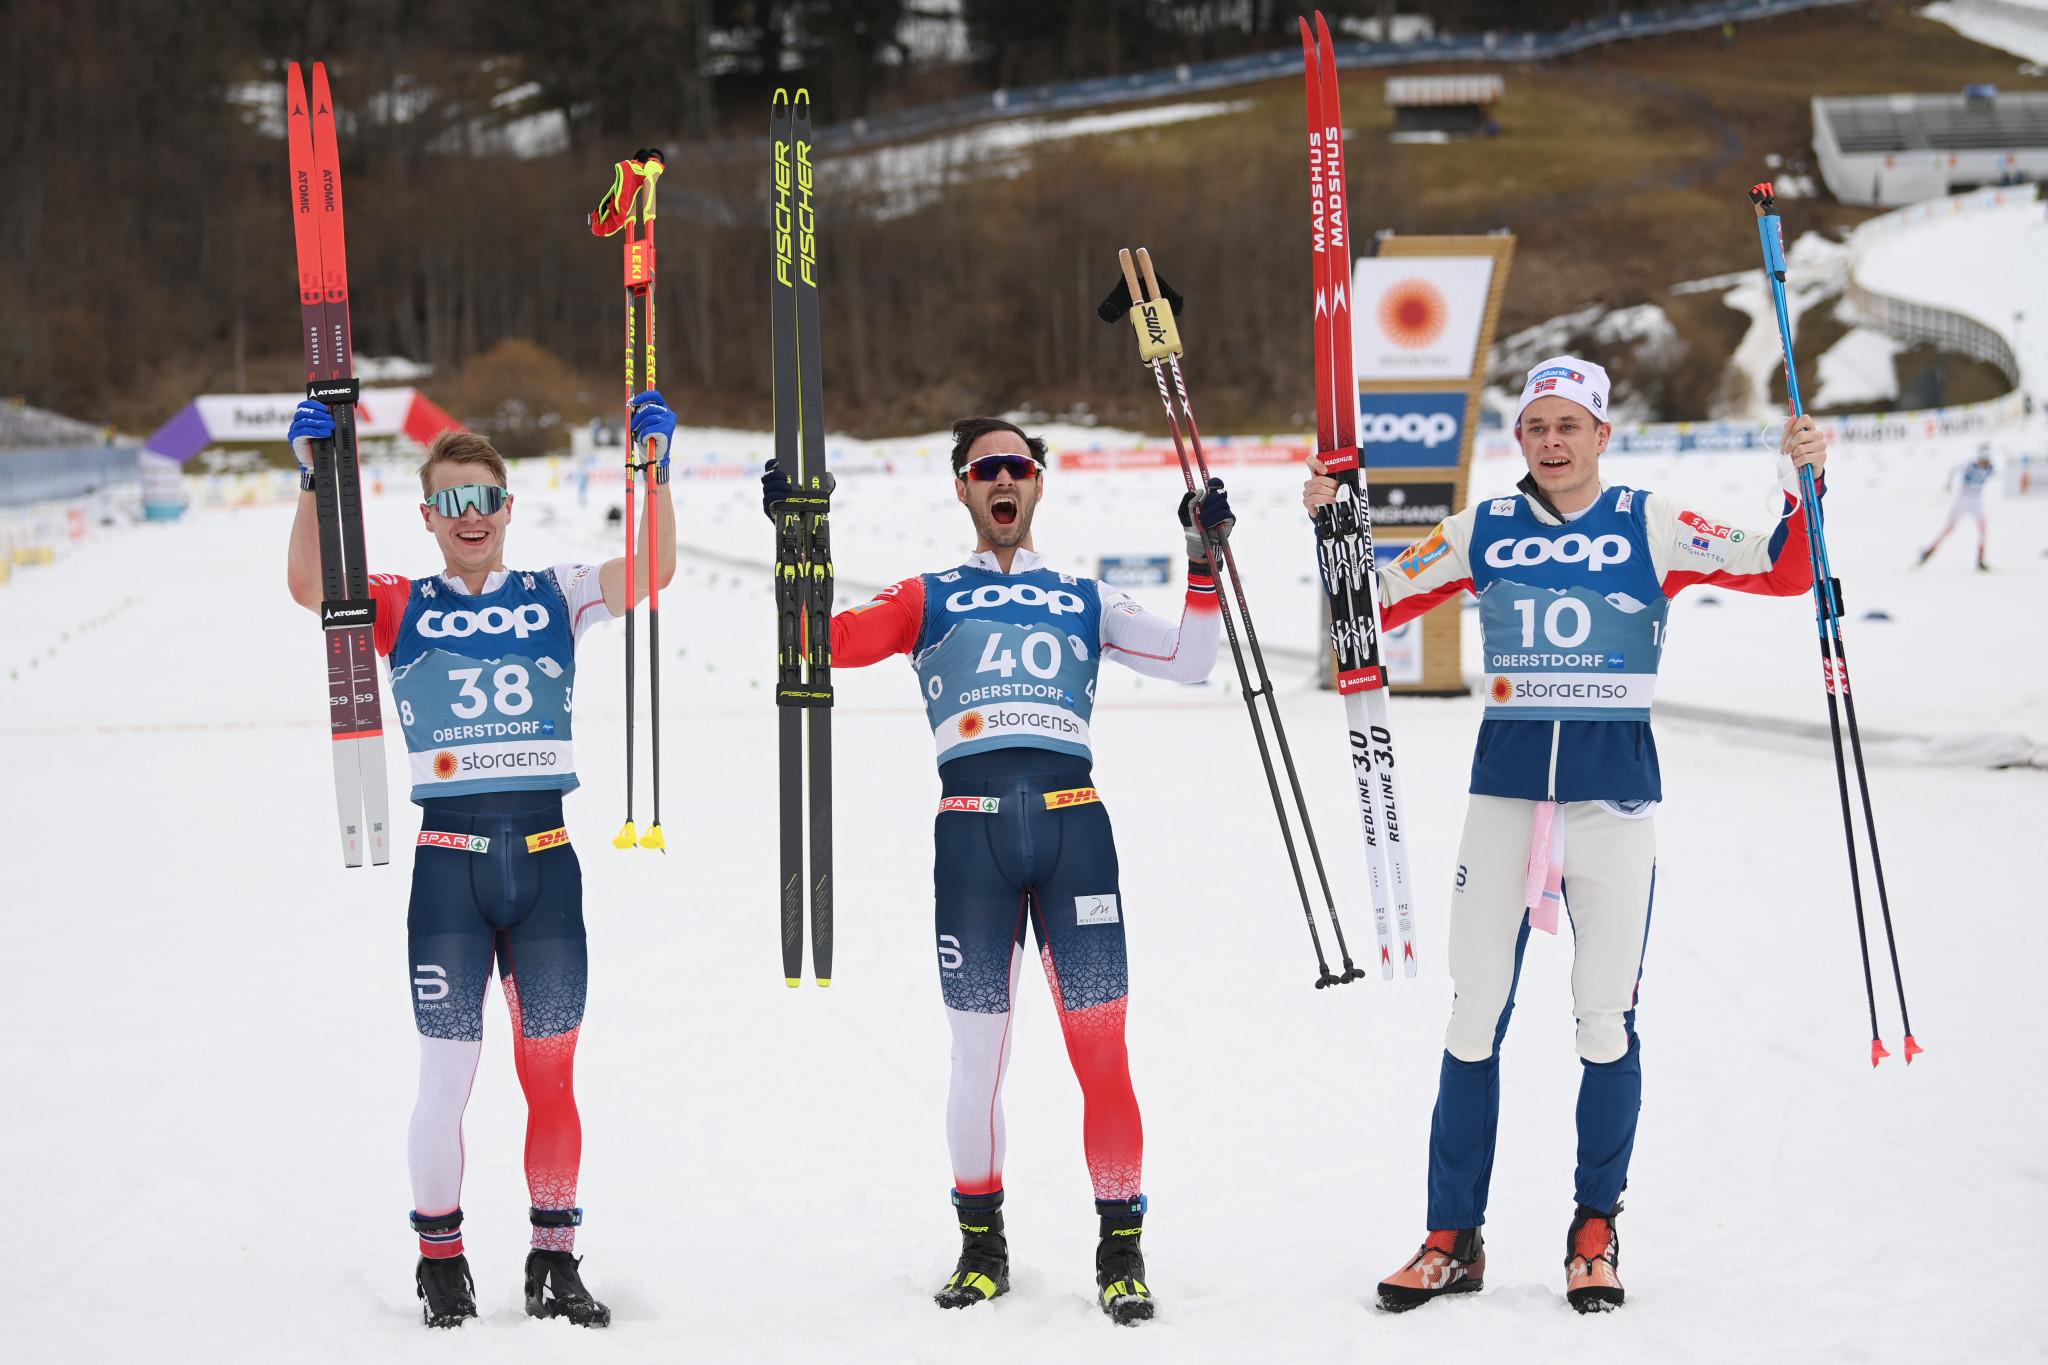 Holund and Lundby produce more Norwegian joy at Nordic World Ski Championships